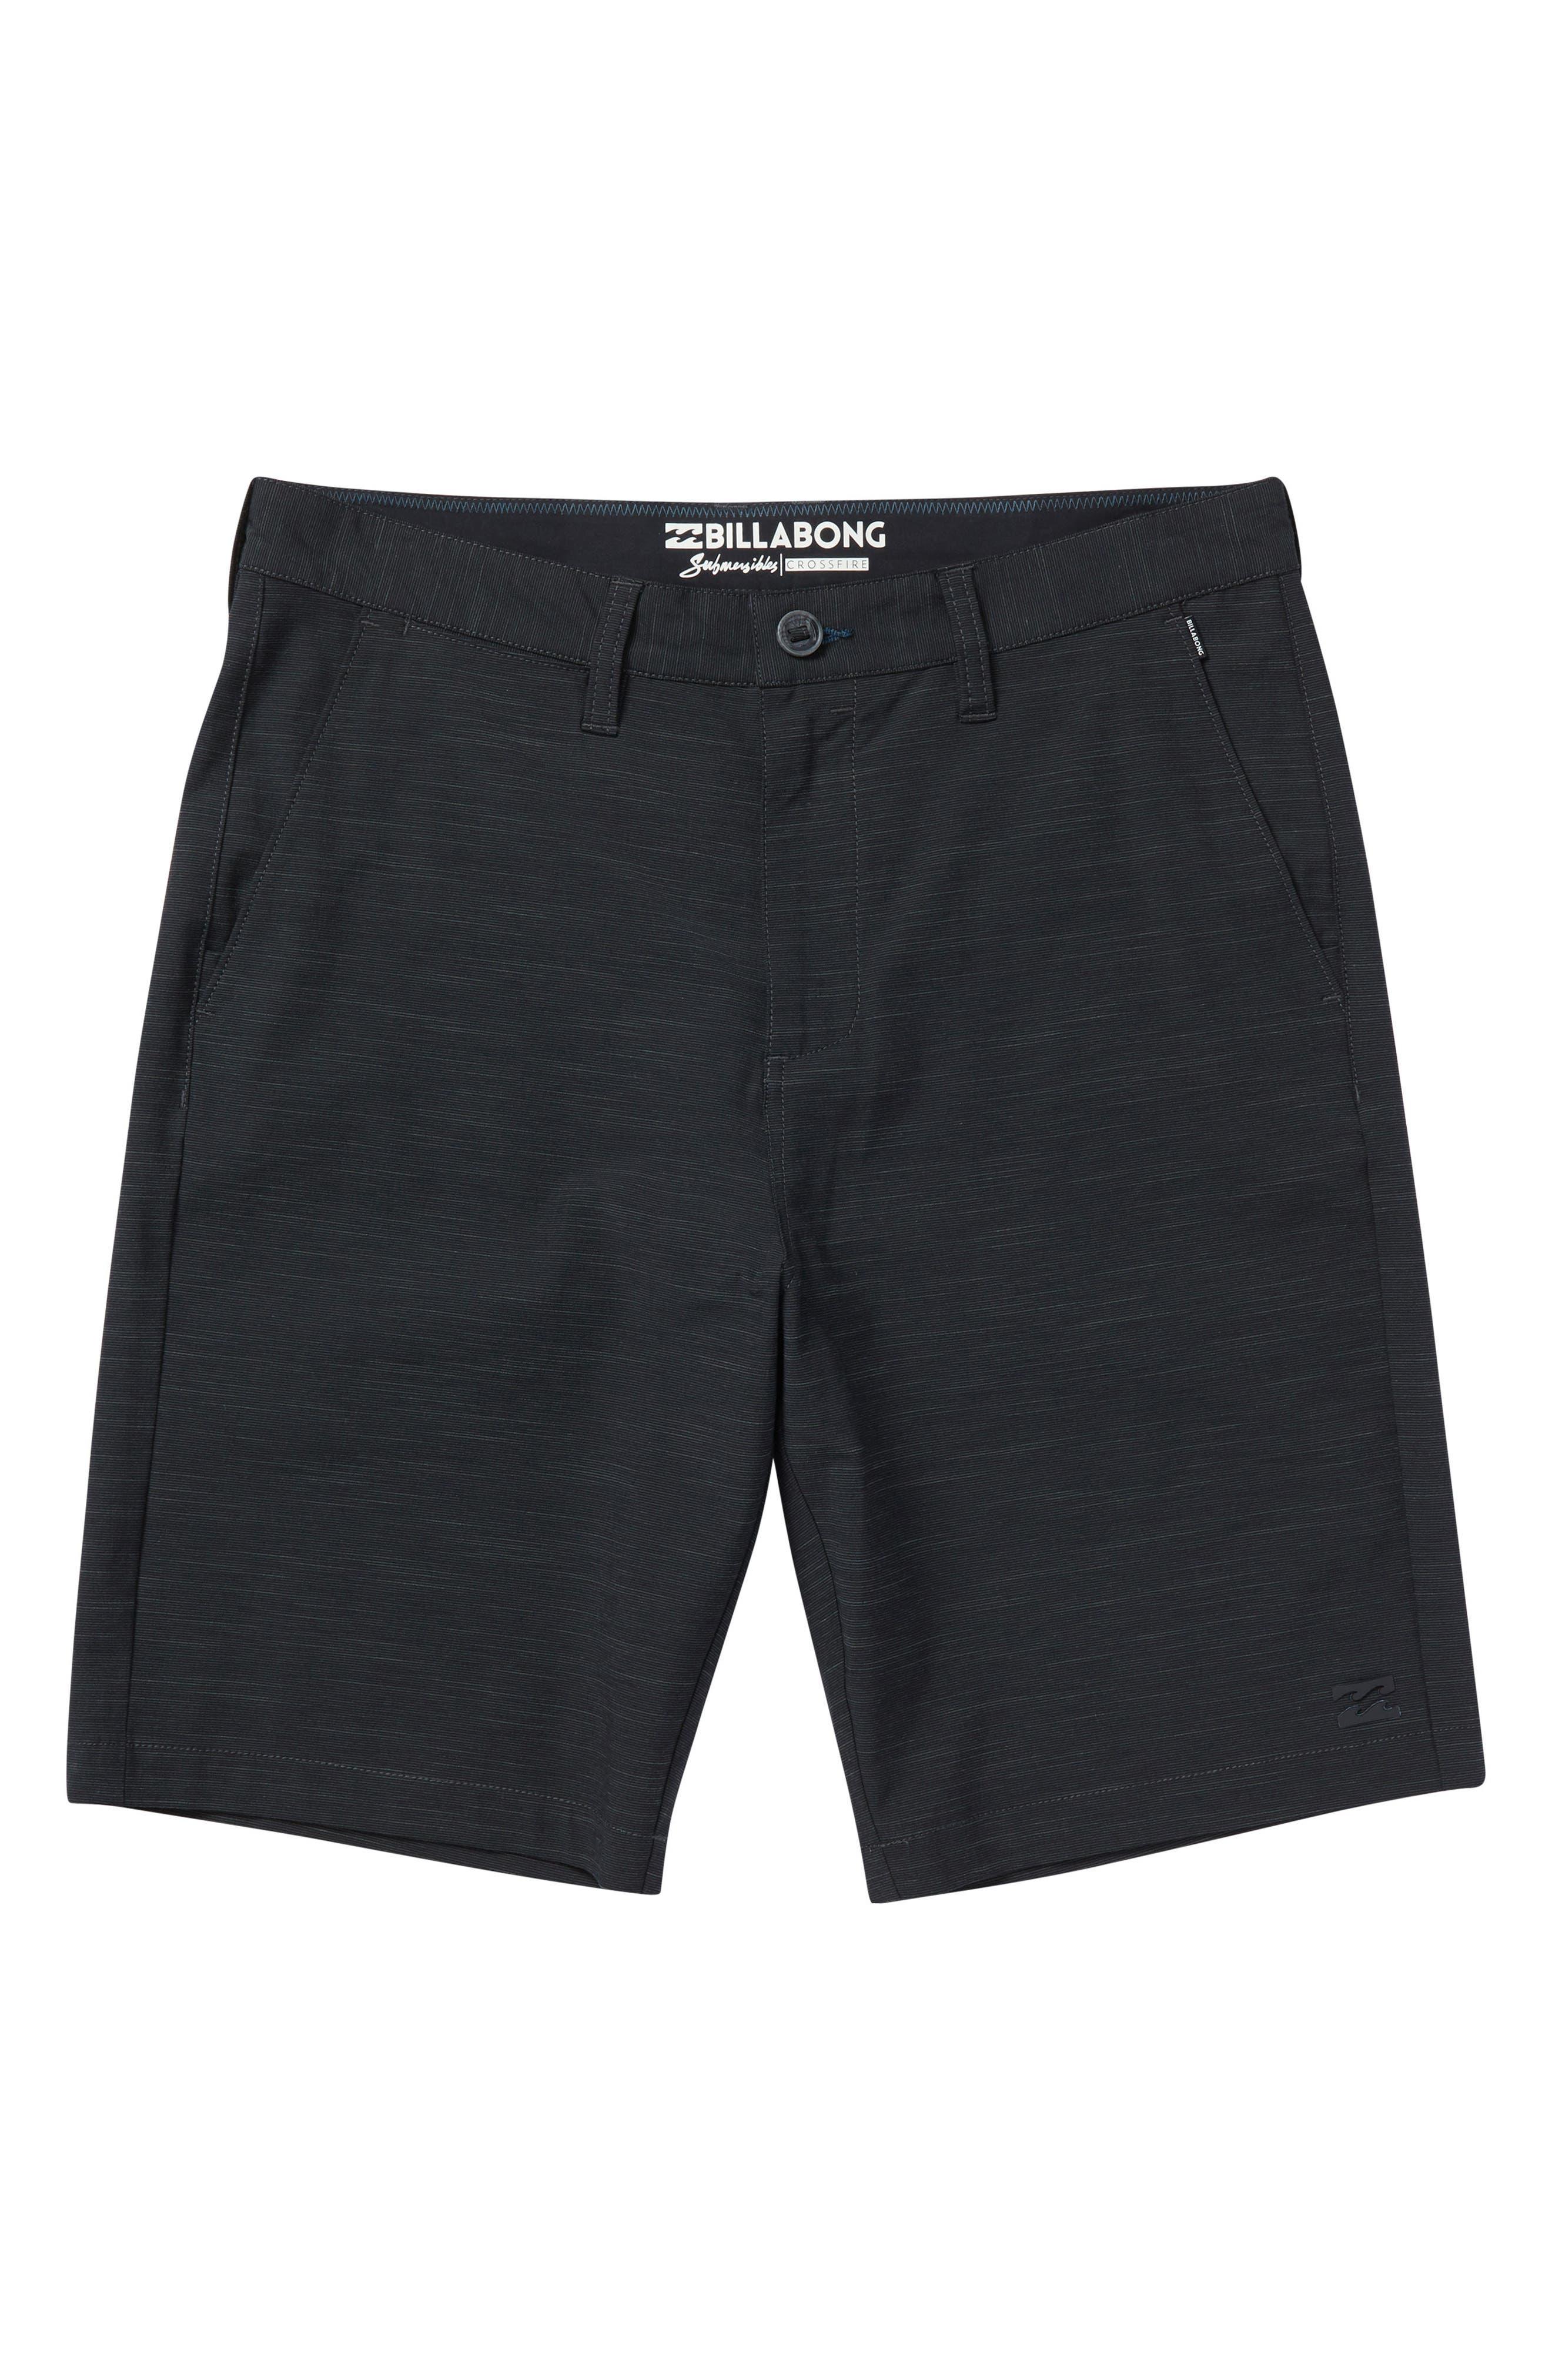 Crossfire X Hybrid Shorts,                         Main,                         color, 001